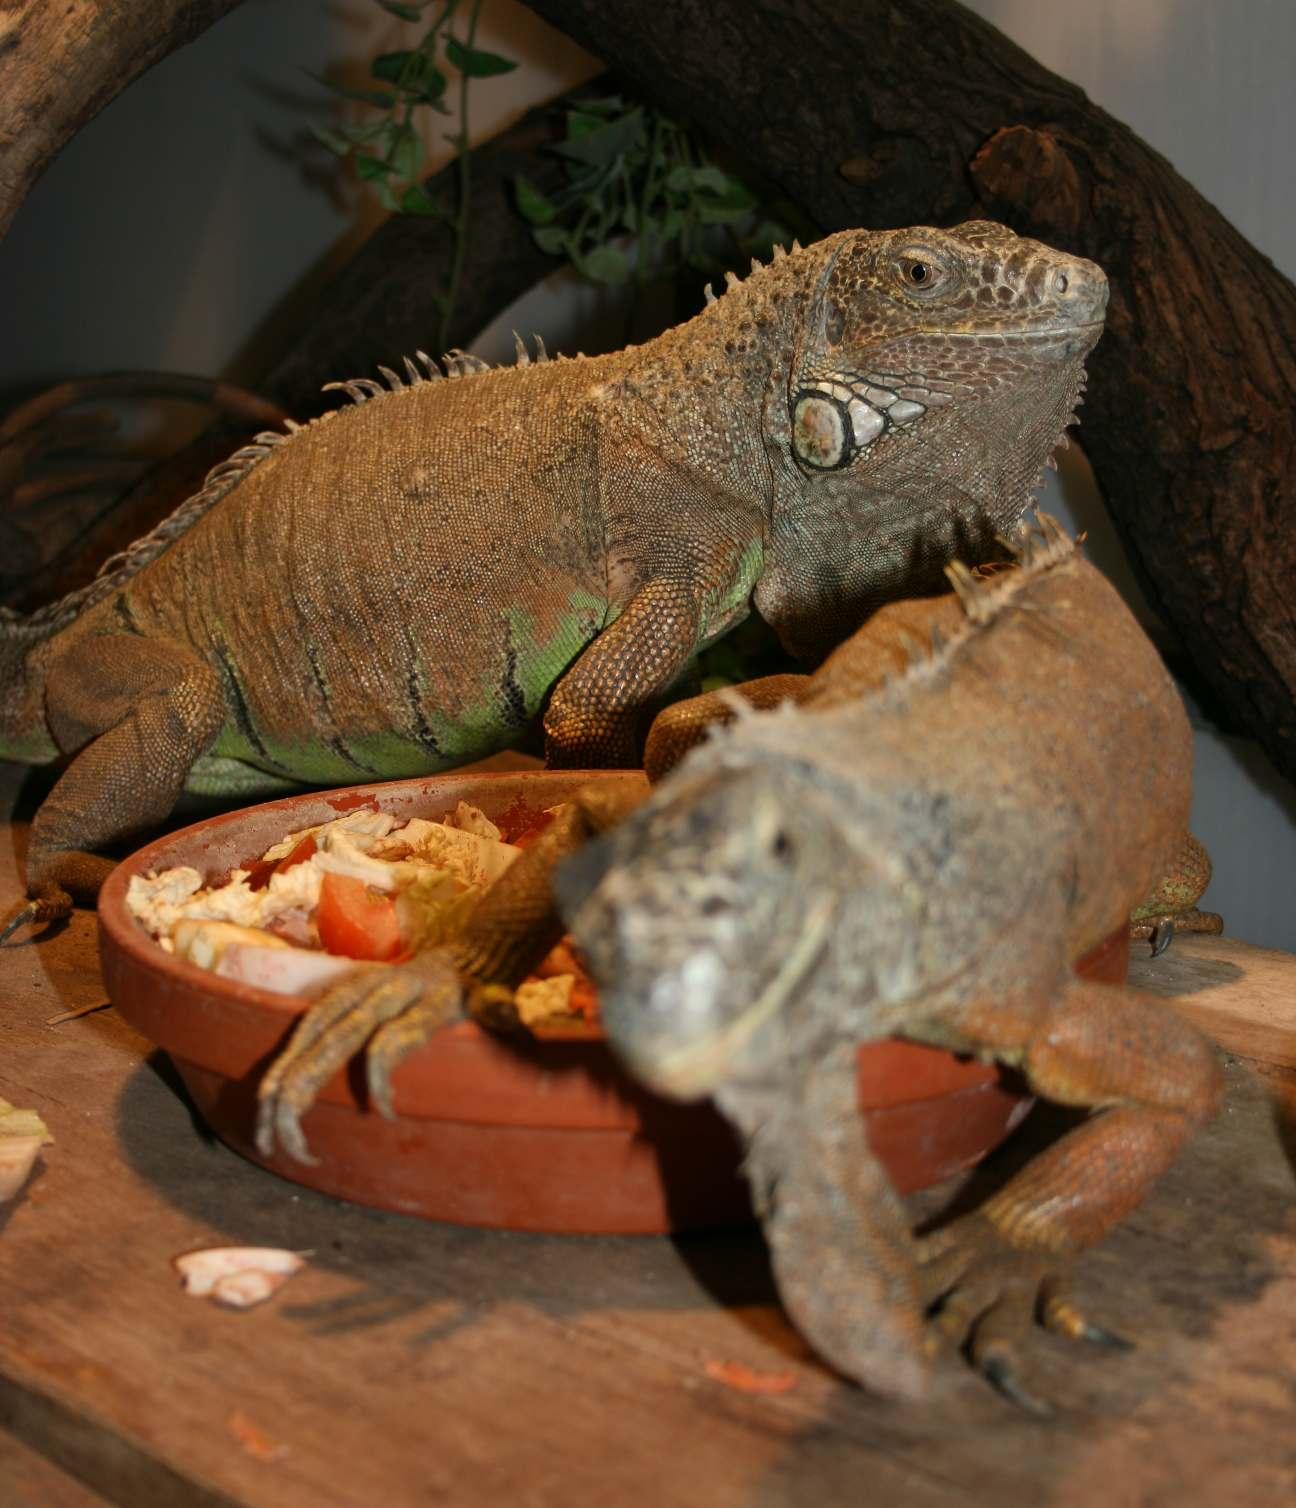 Leguán zelený iguana iguana